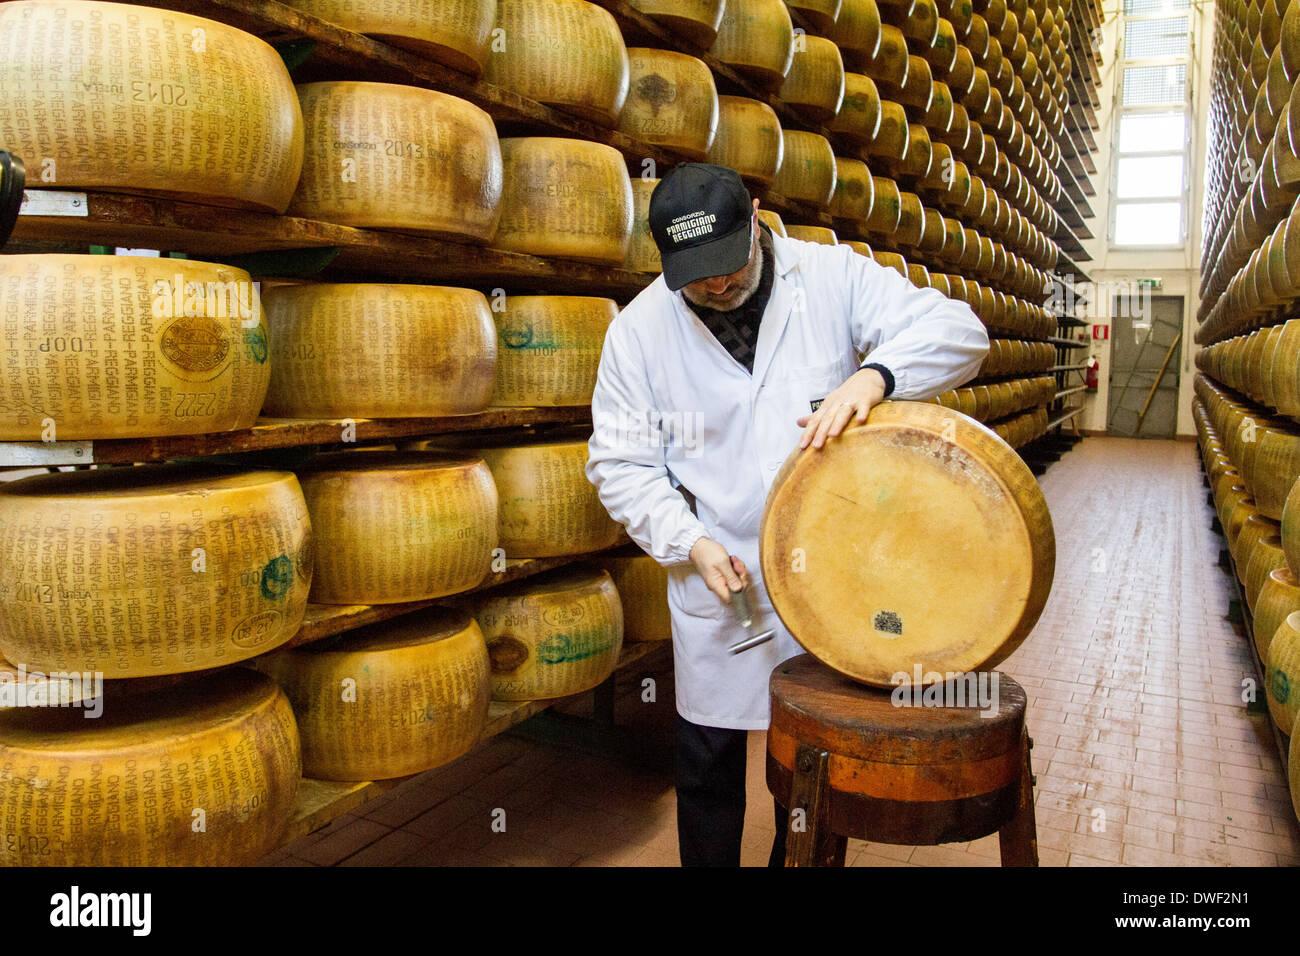 Parmigiano Reggiano cheese producer factory in Baganzolino, Parma, Emilia Romagna, Italy Stock Photo